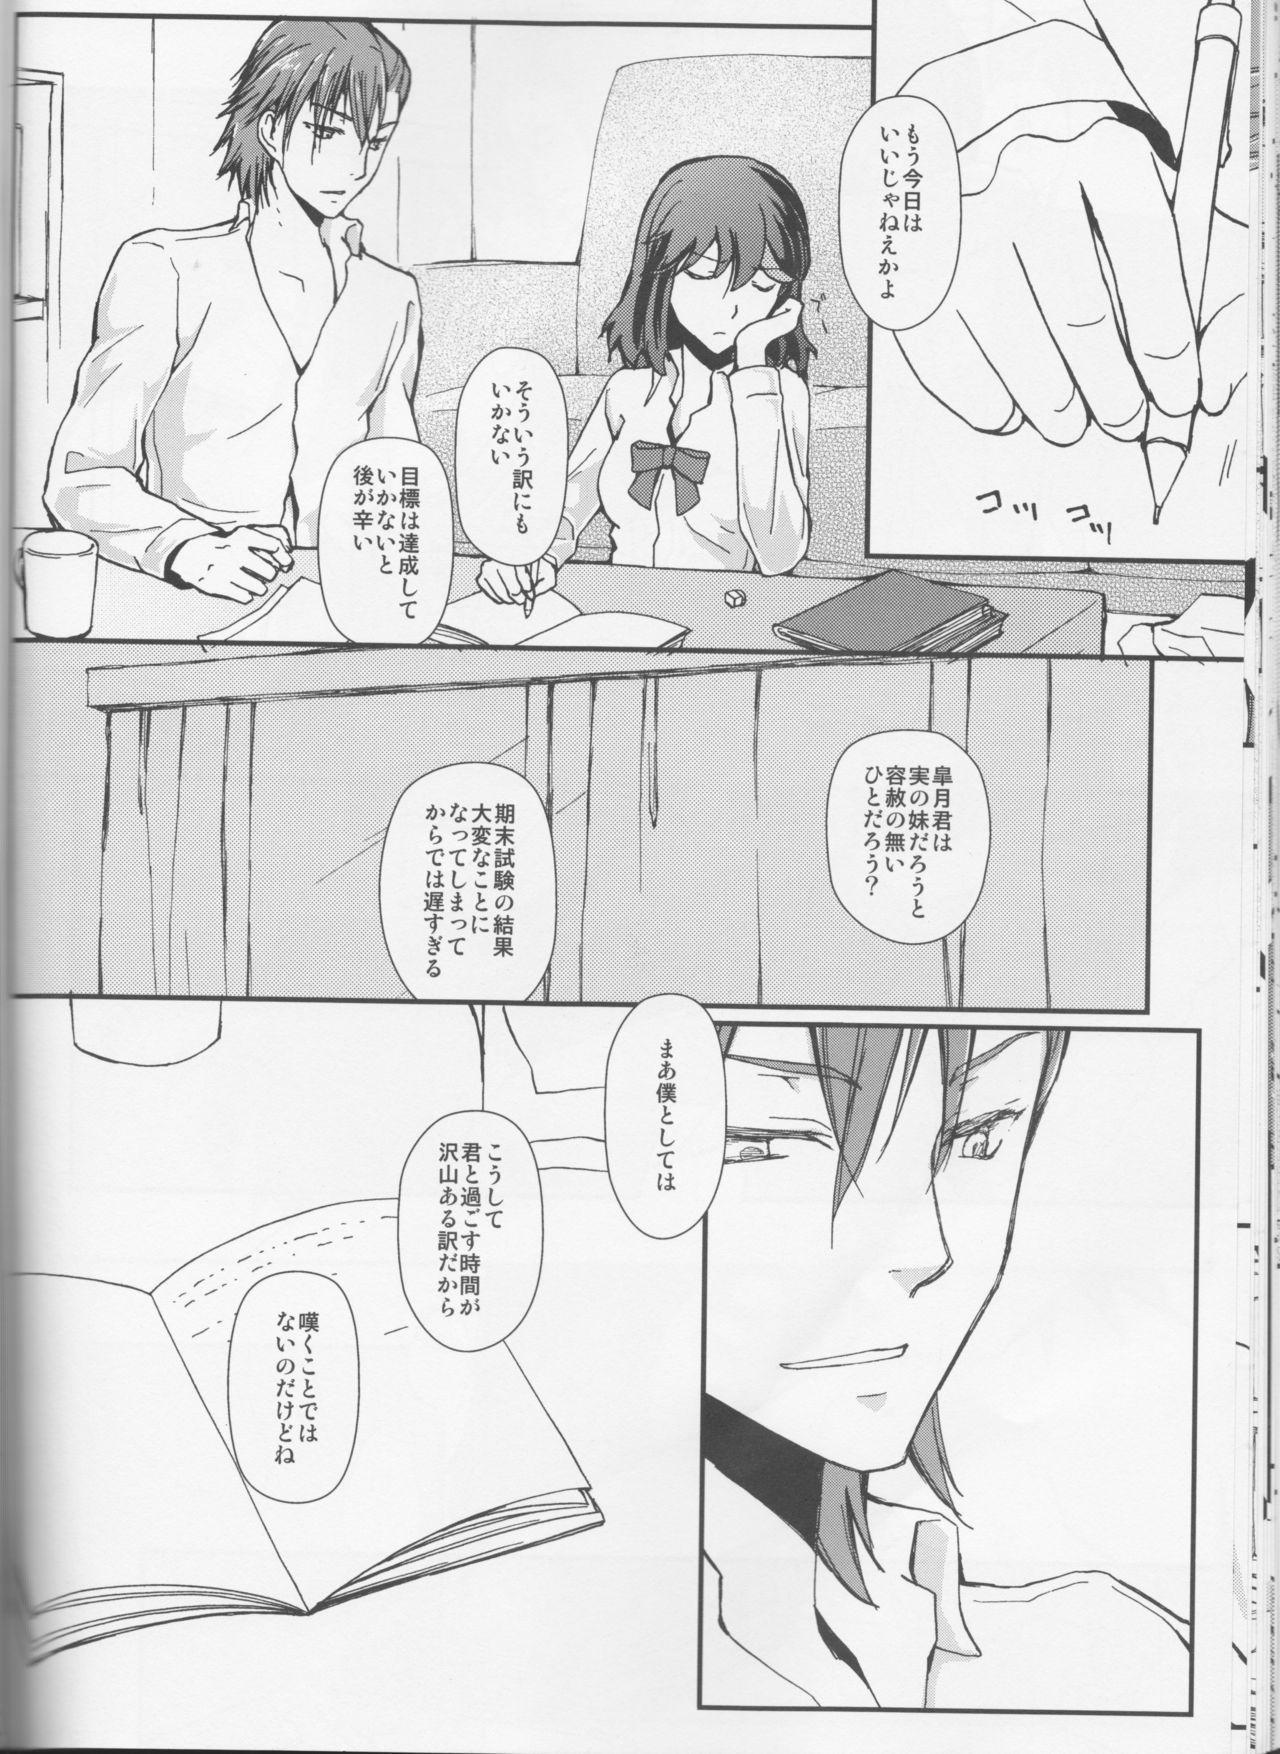 [Daylight (Ren Mizuha)]Usukurenaiiro no hana saku koro(Kill la Kill)) 22